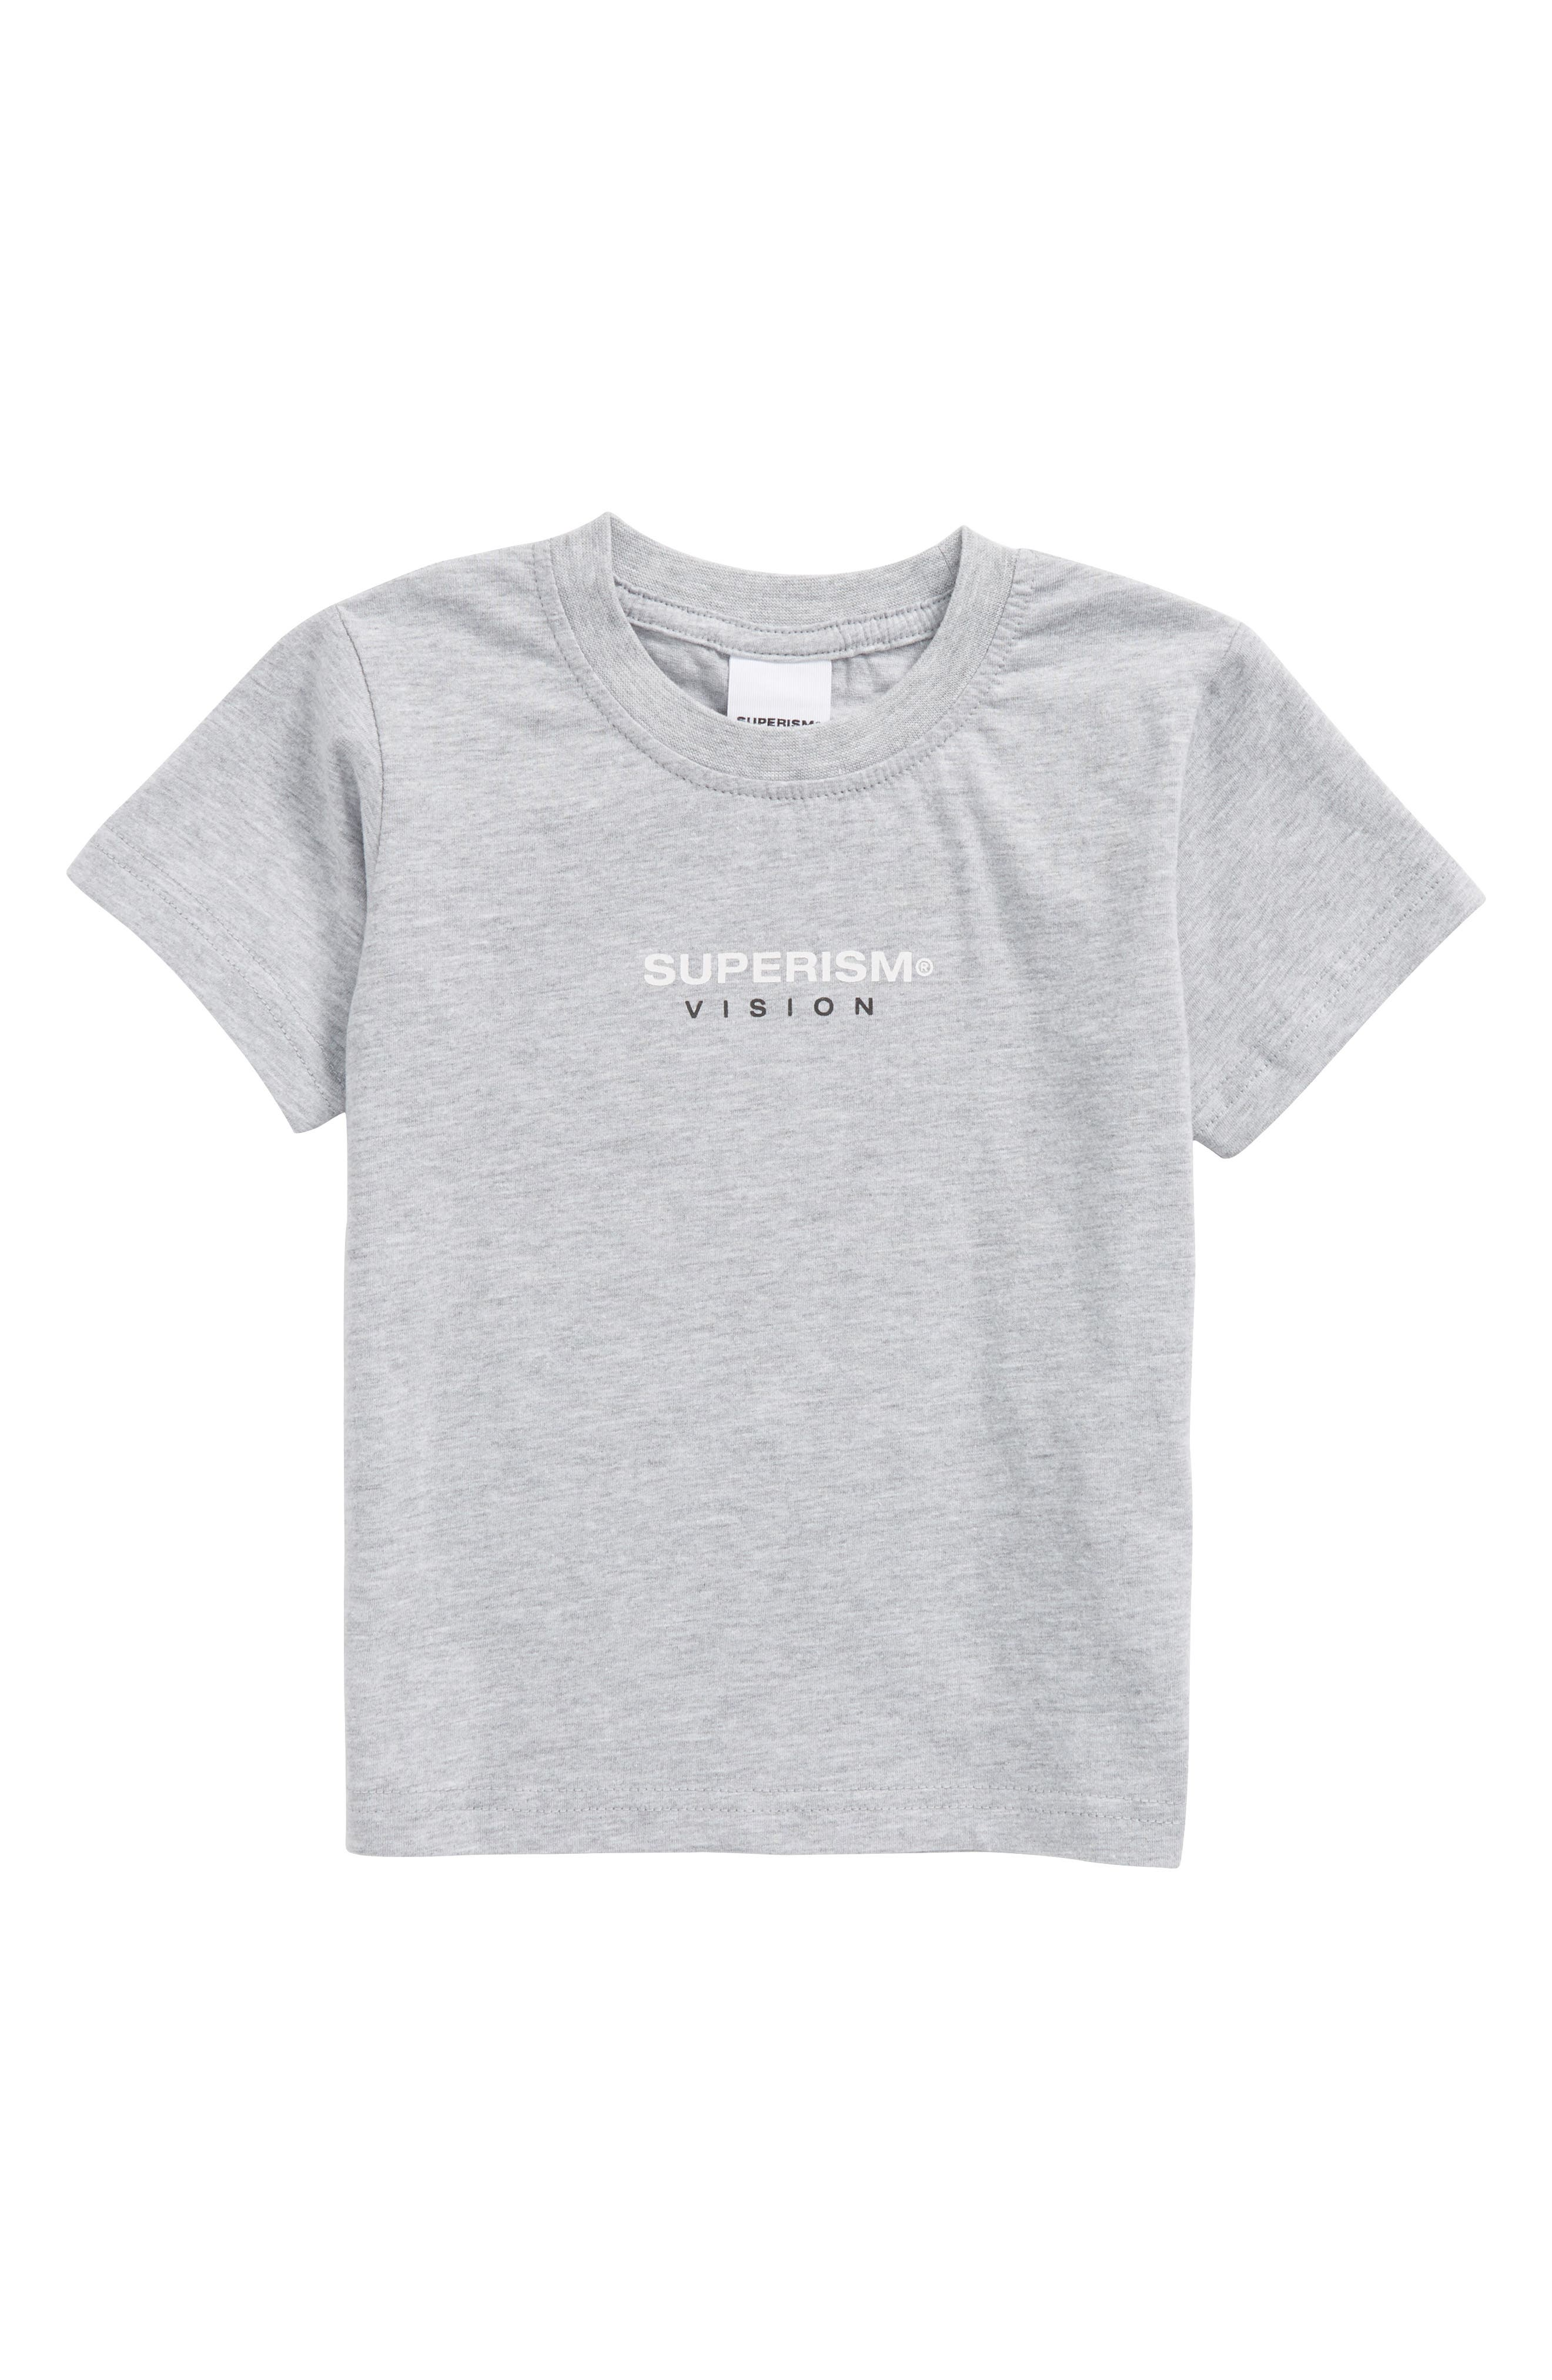 Rose Vision T-Shirt,                         Main,                         color, Heather Grey